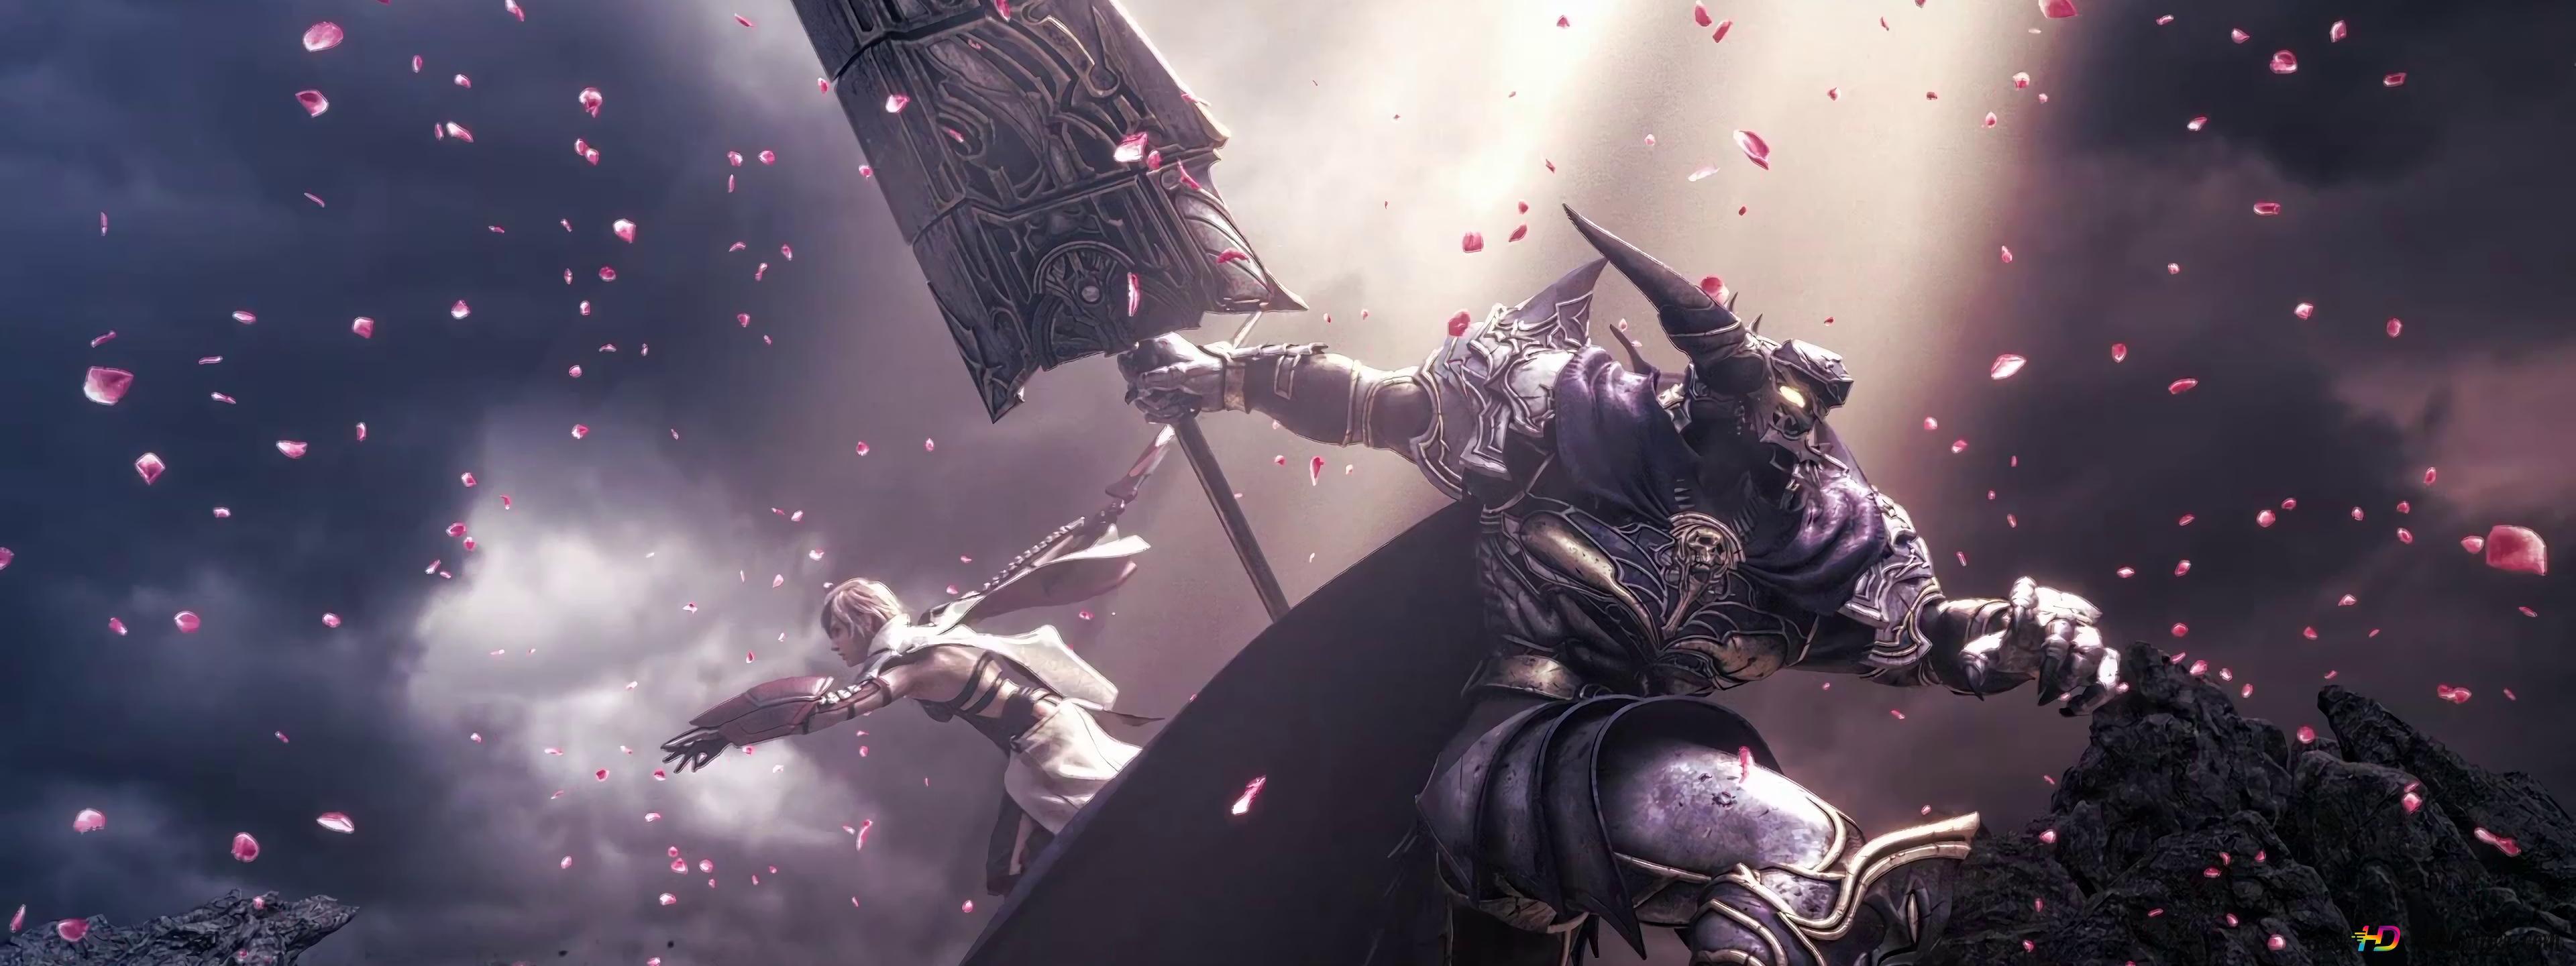 Dissidia Final Fantasy Nt Garland Hd Wallpaper Download